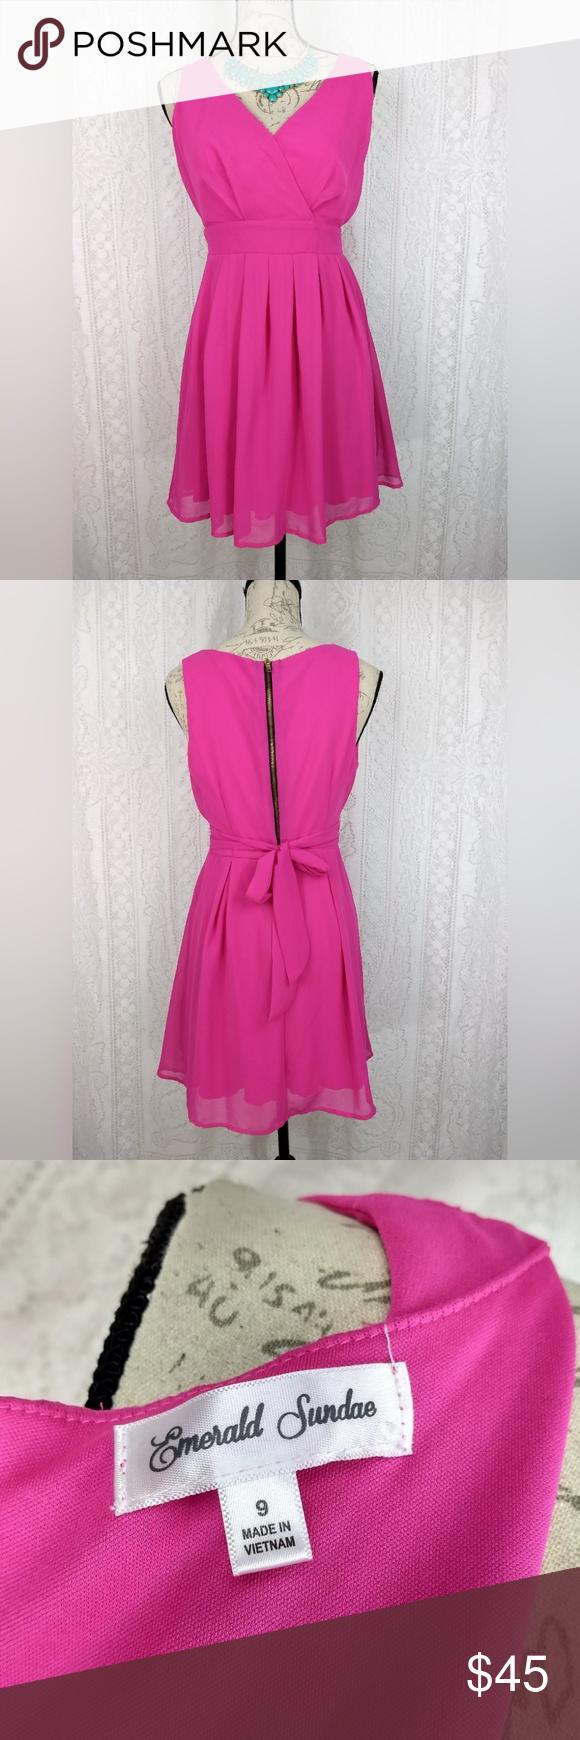 Emerald sundae hot pink cocktail dress jr size my posh closet